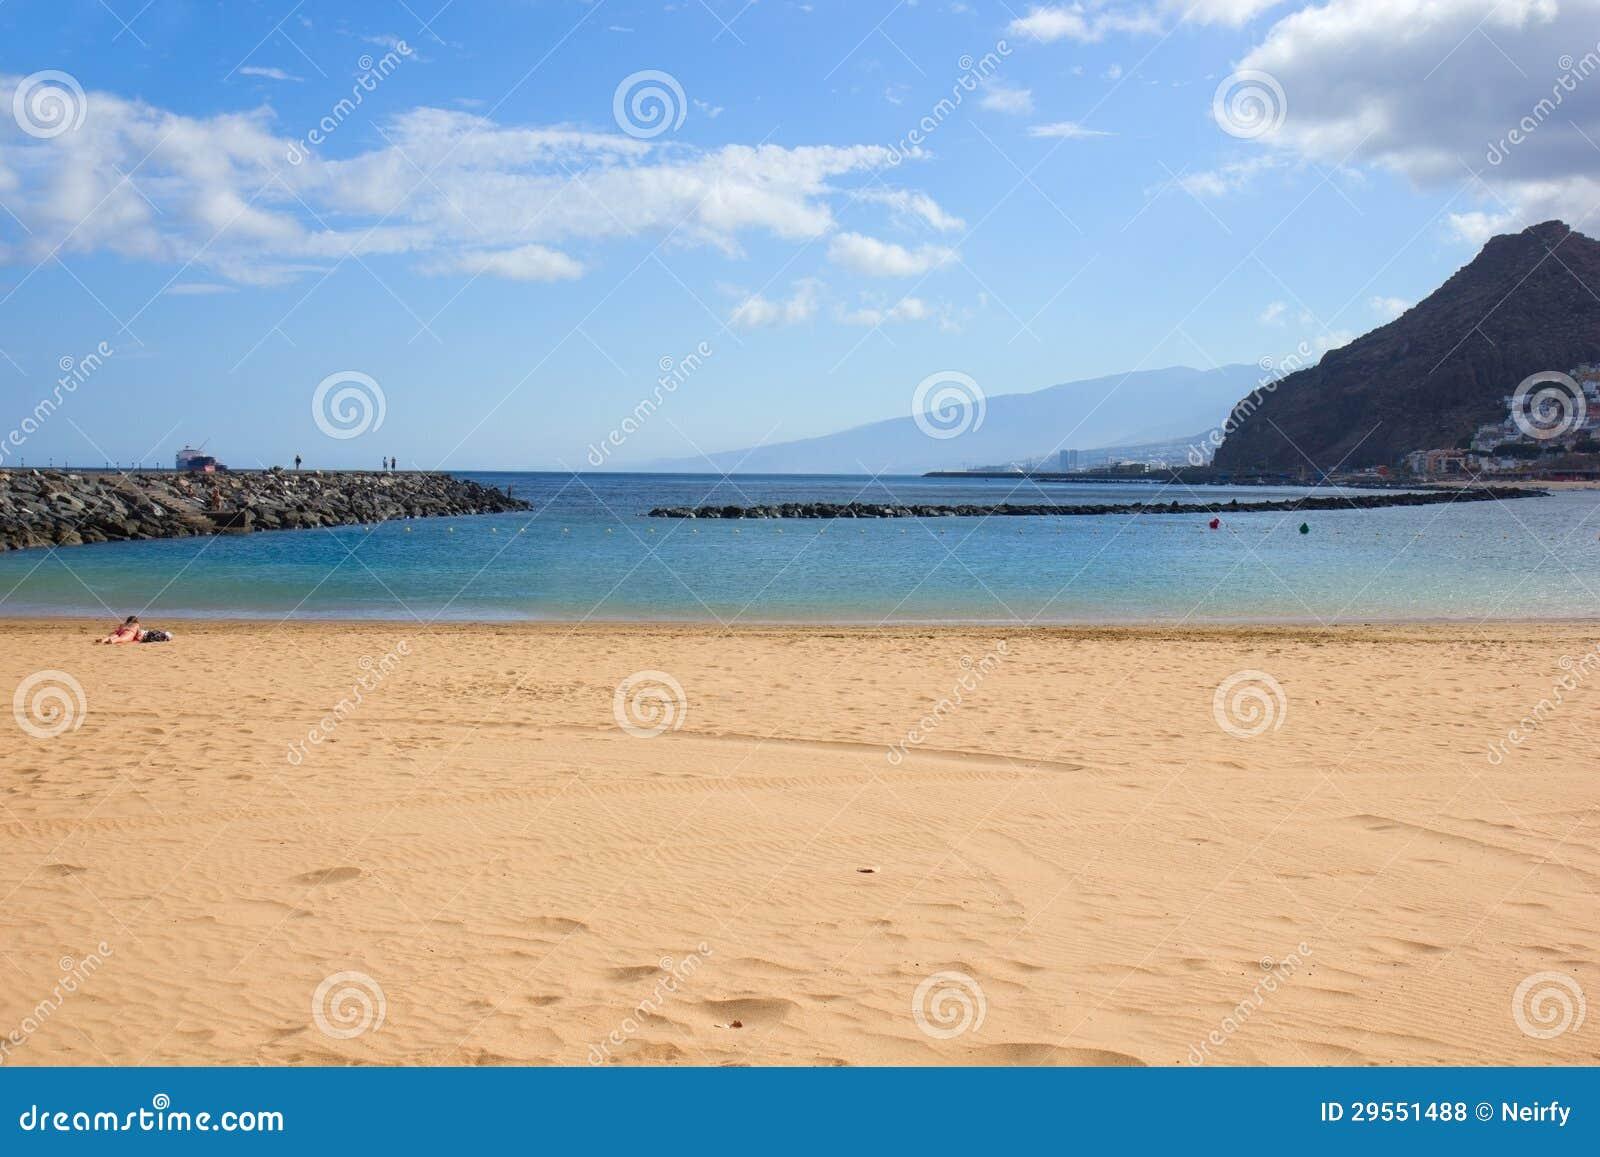 Strand von Santa Cruzde Teneriffa, Spanien